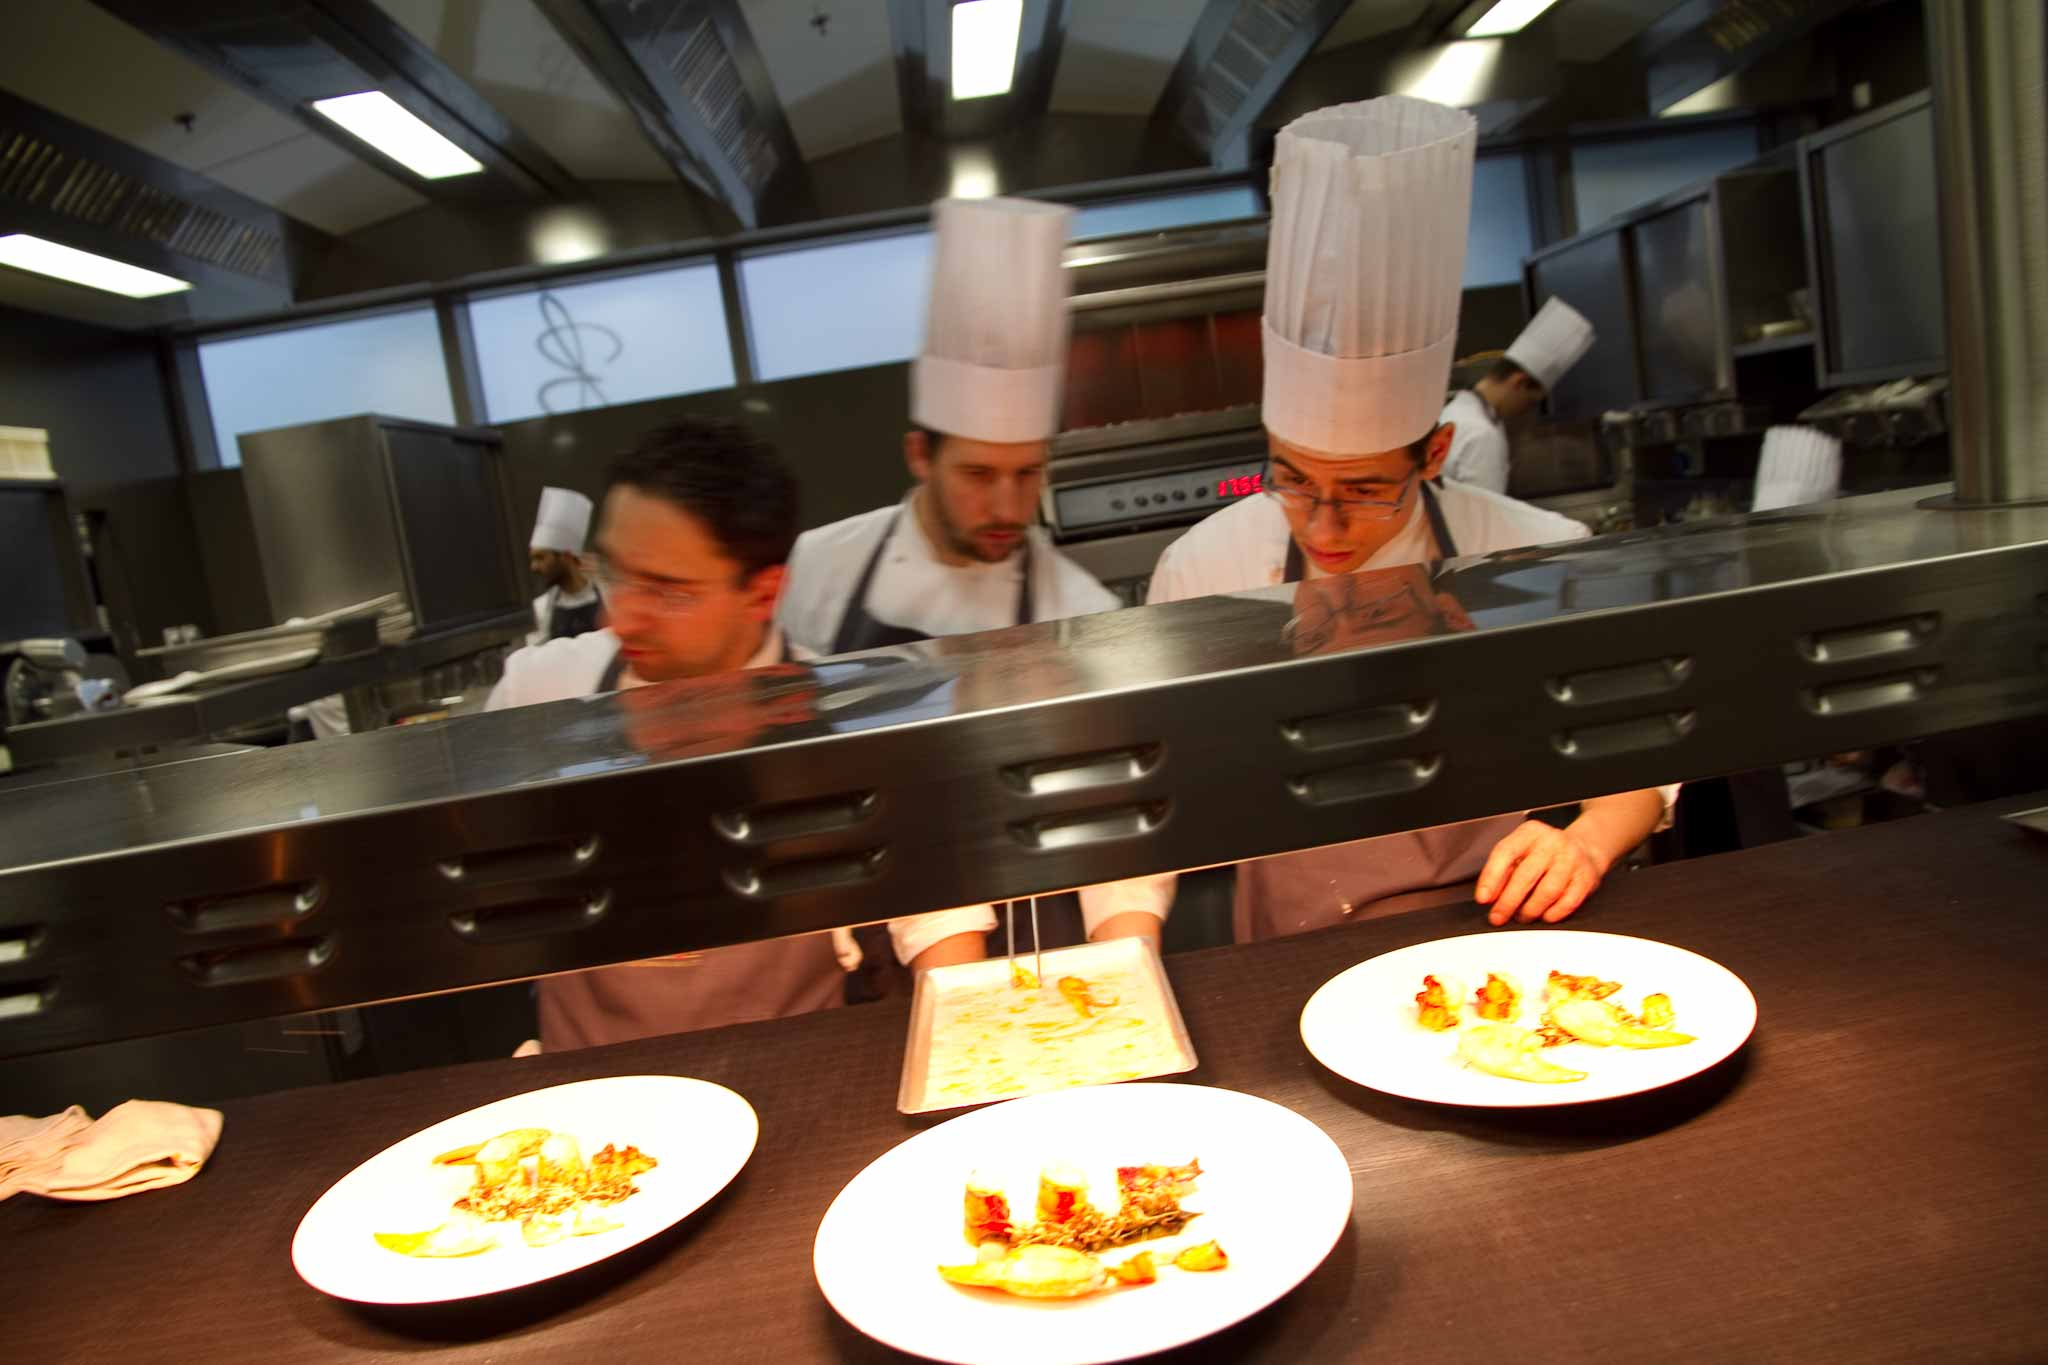 cucina-ristorante-berton